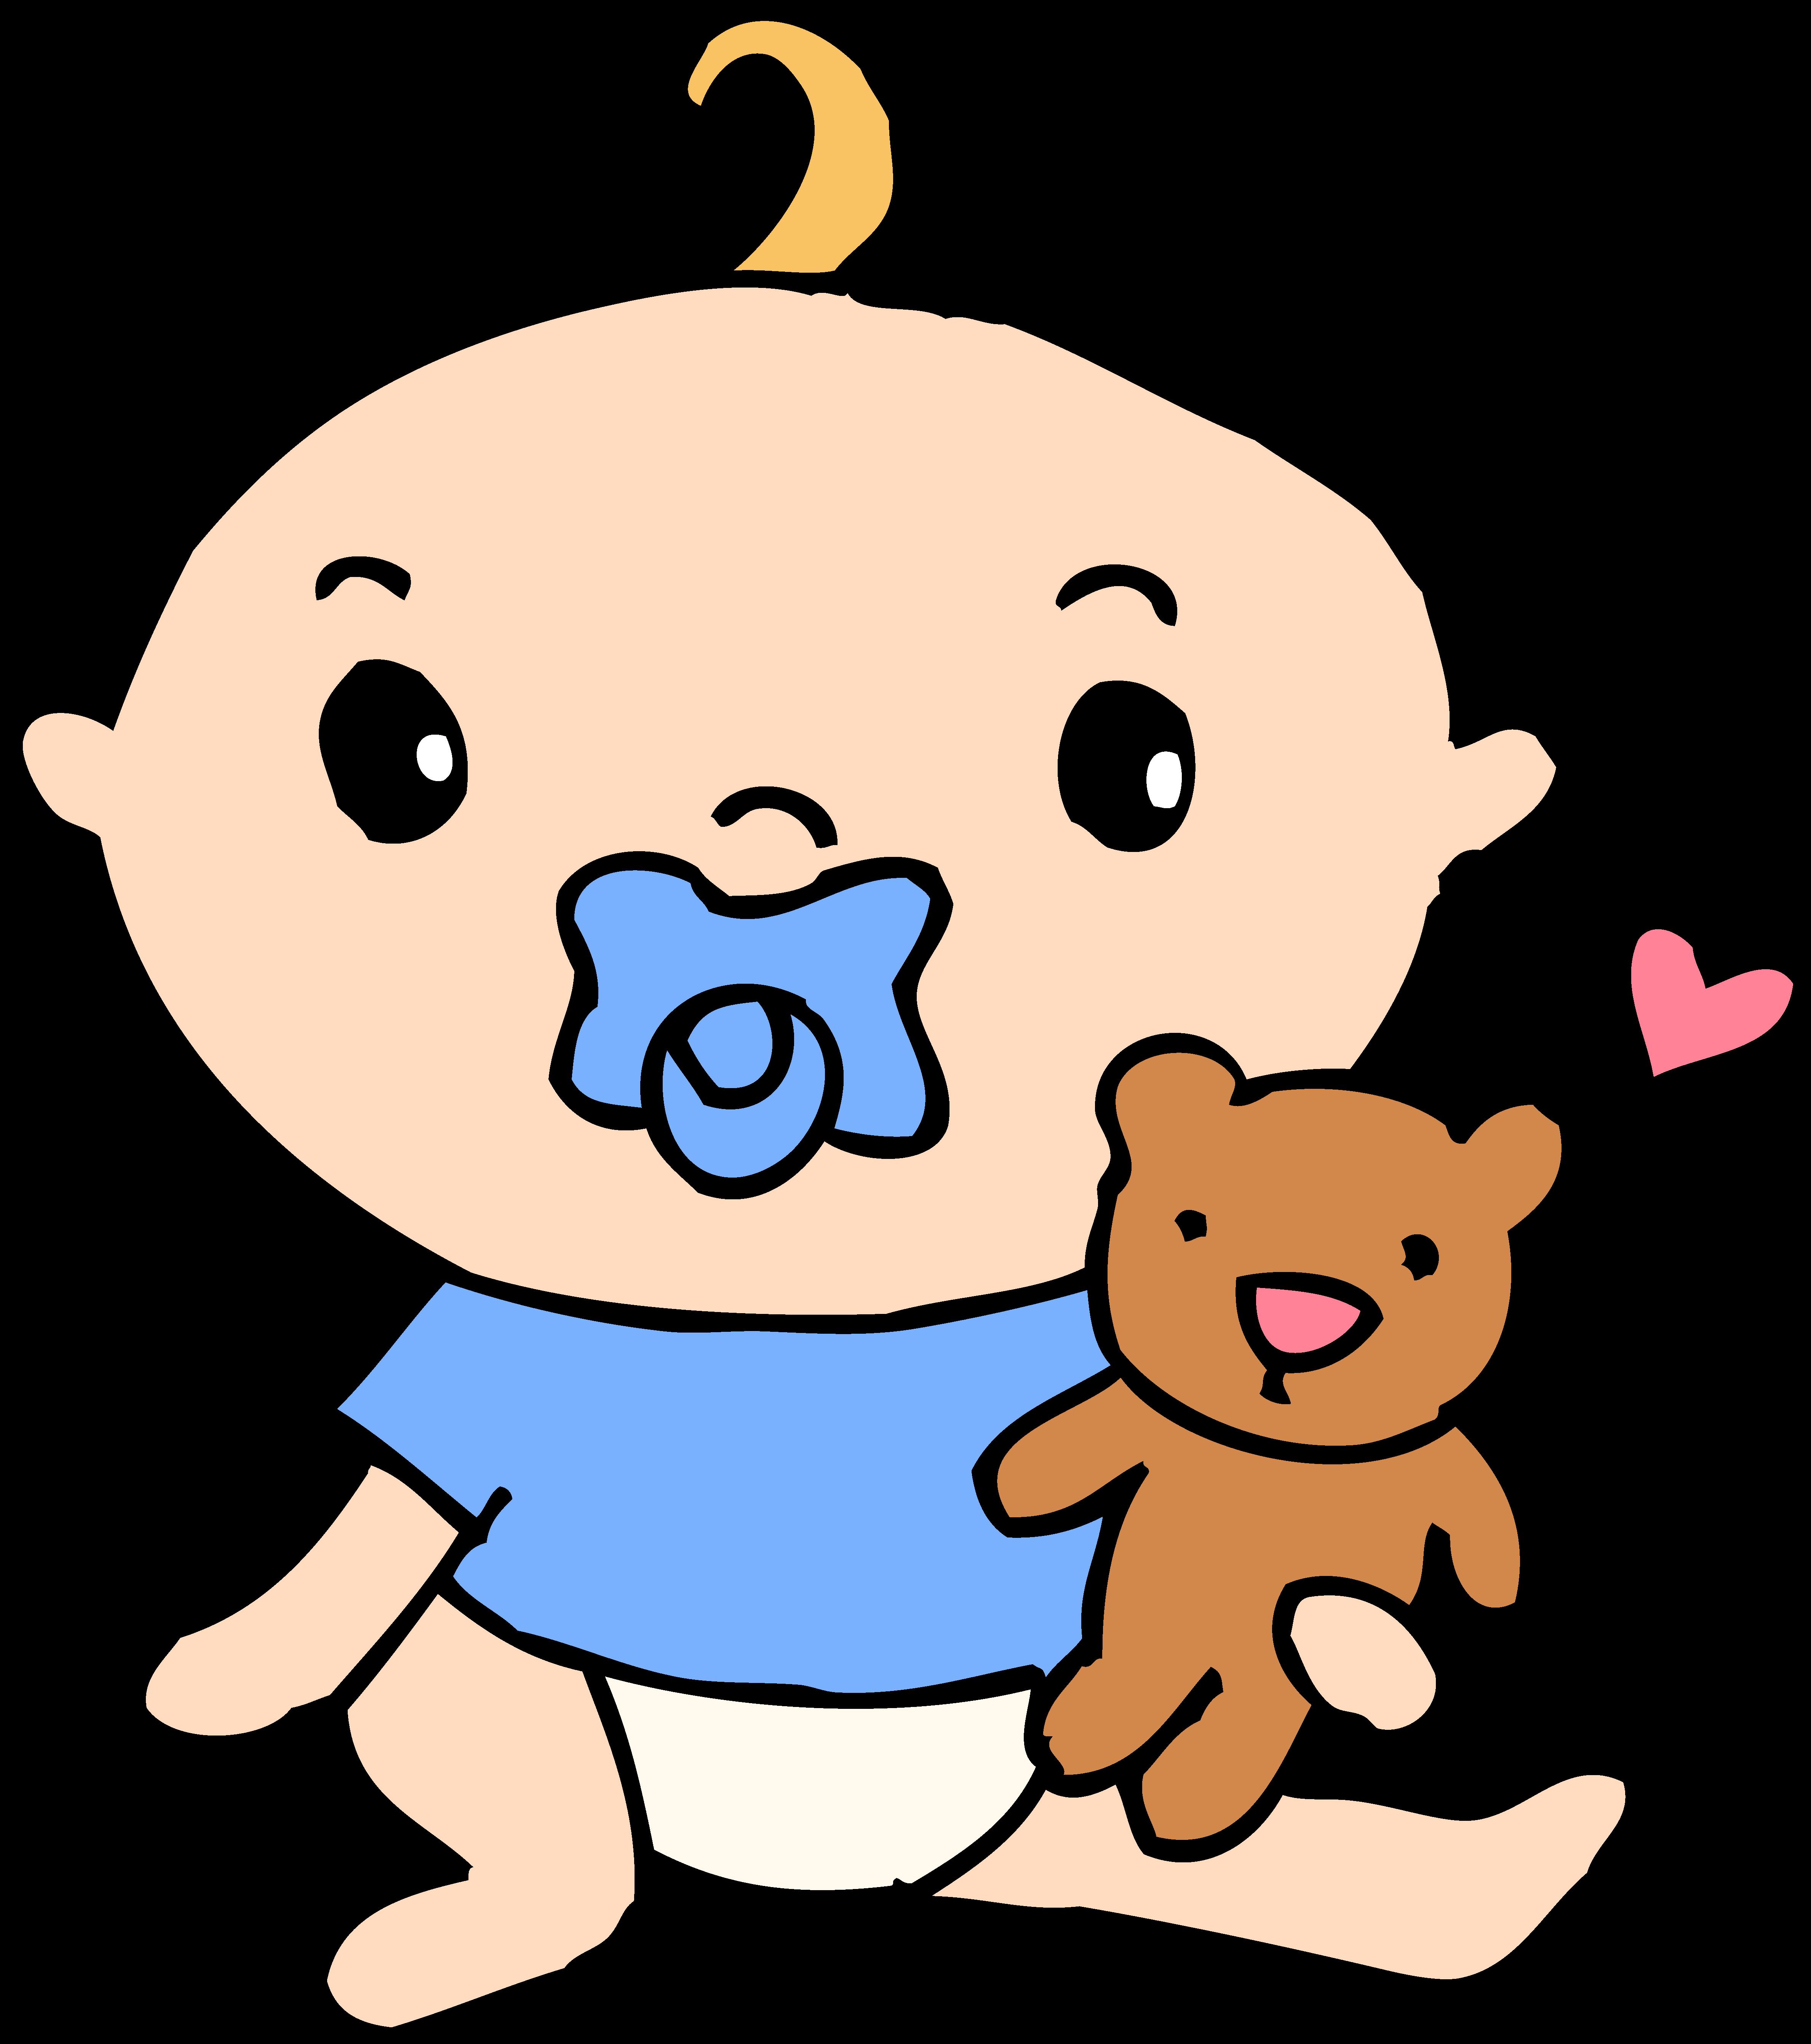 Babysitting clipart infant. Baby cliparts zone superhero